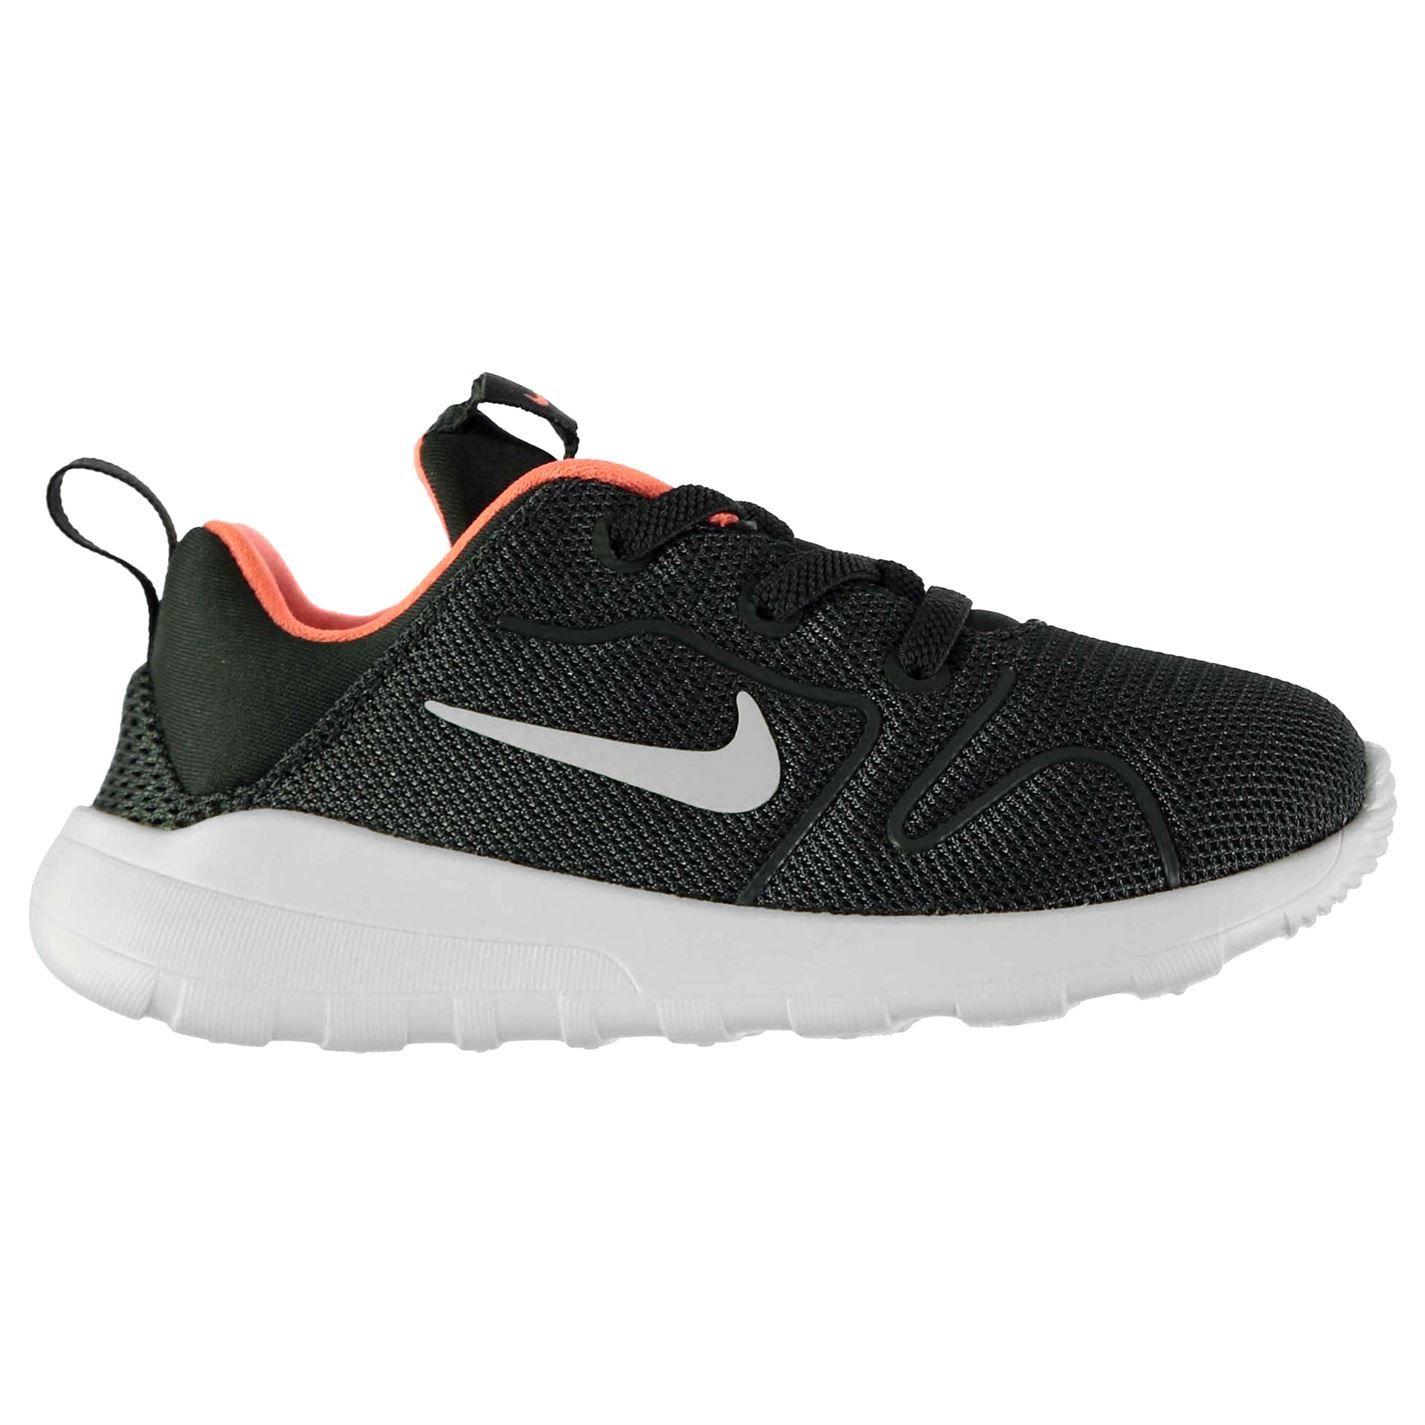 24fae0a500a Nike Kaishi 2.0 Girls Trainers (02109002_2) - Sports.mymall.bg